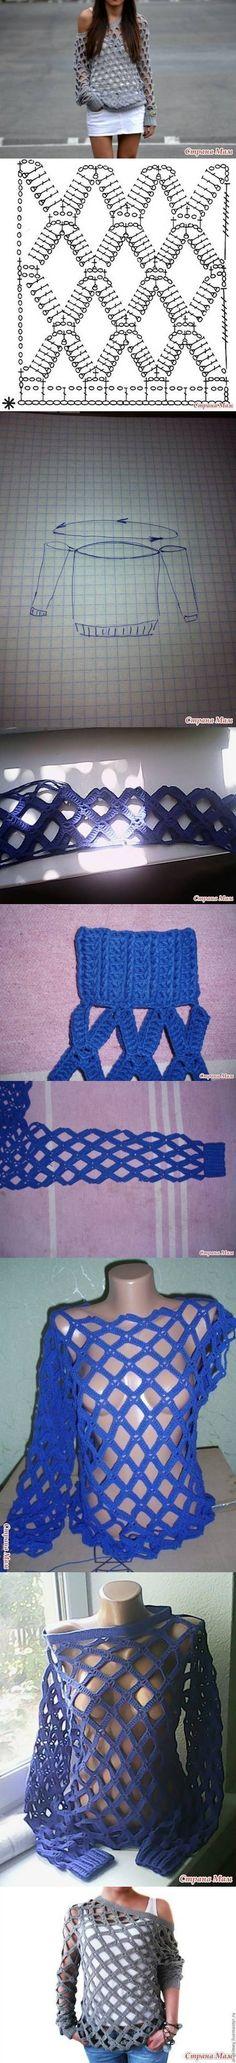 DIY Crochet Blouse